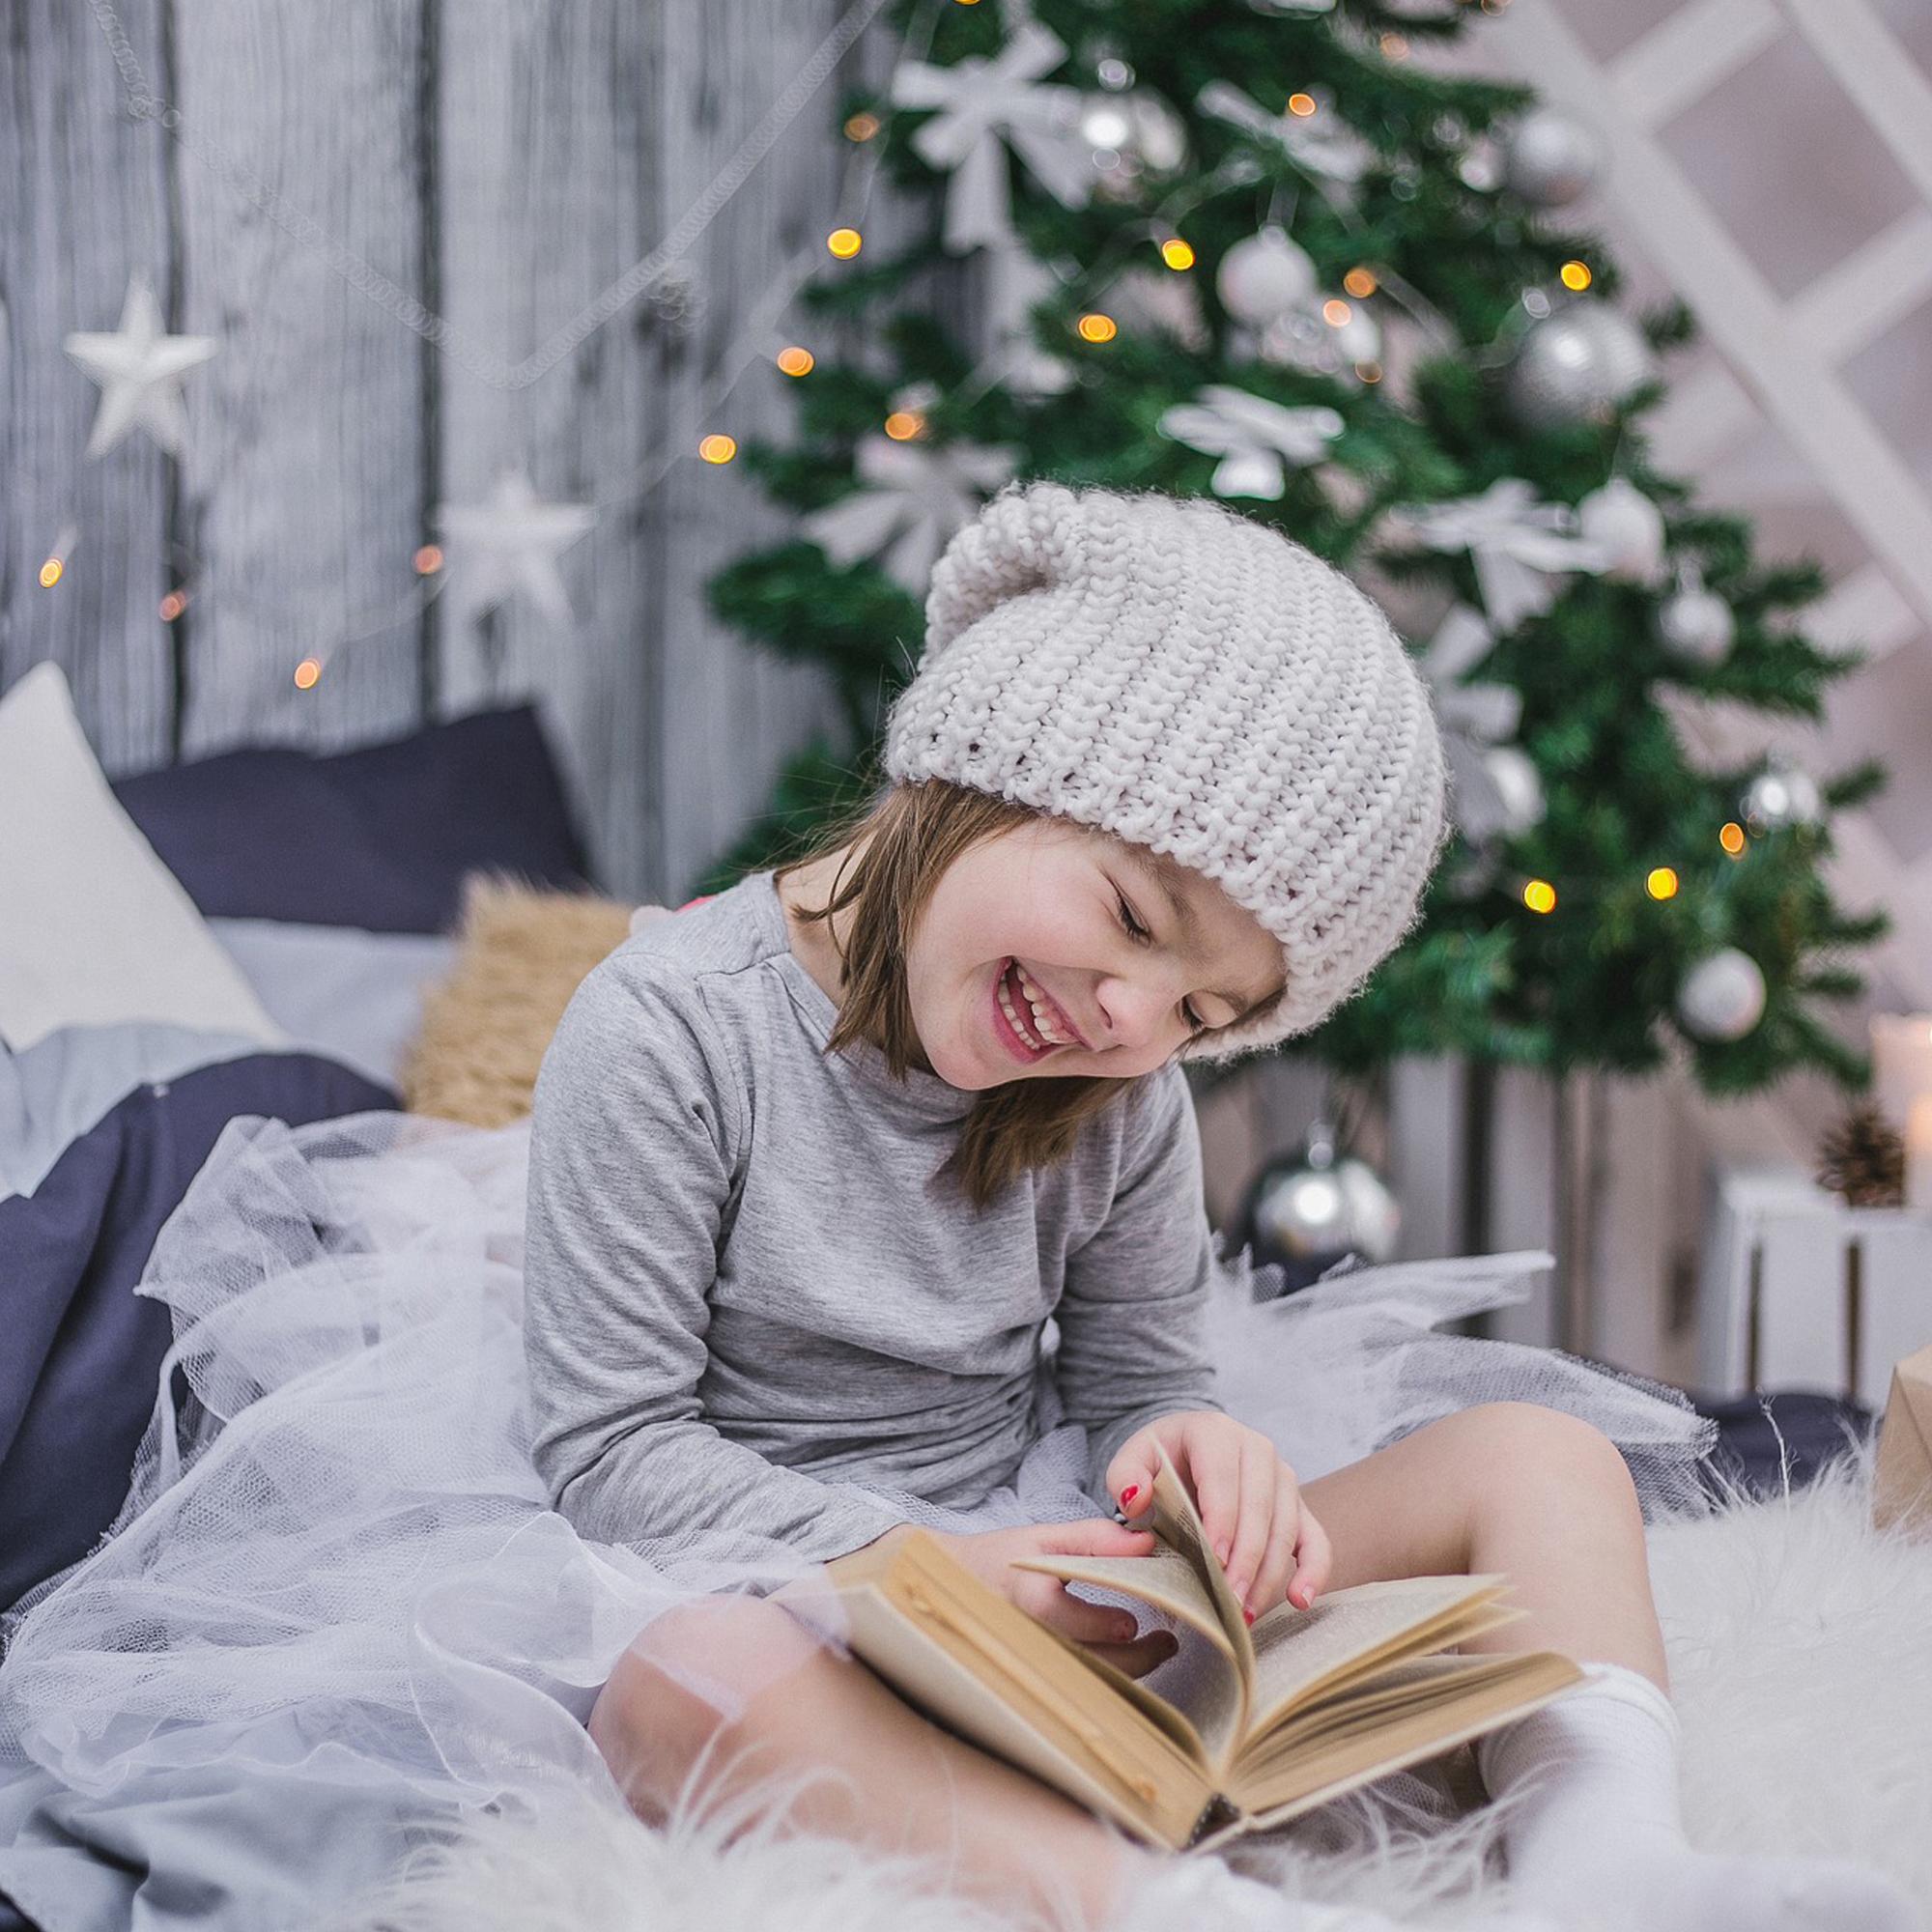 Santa's Sleigh 2018